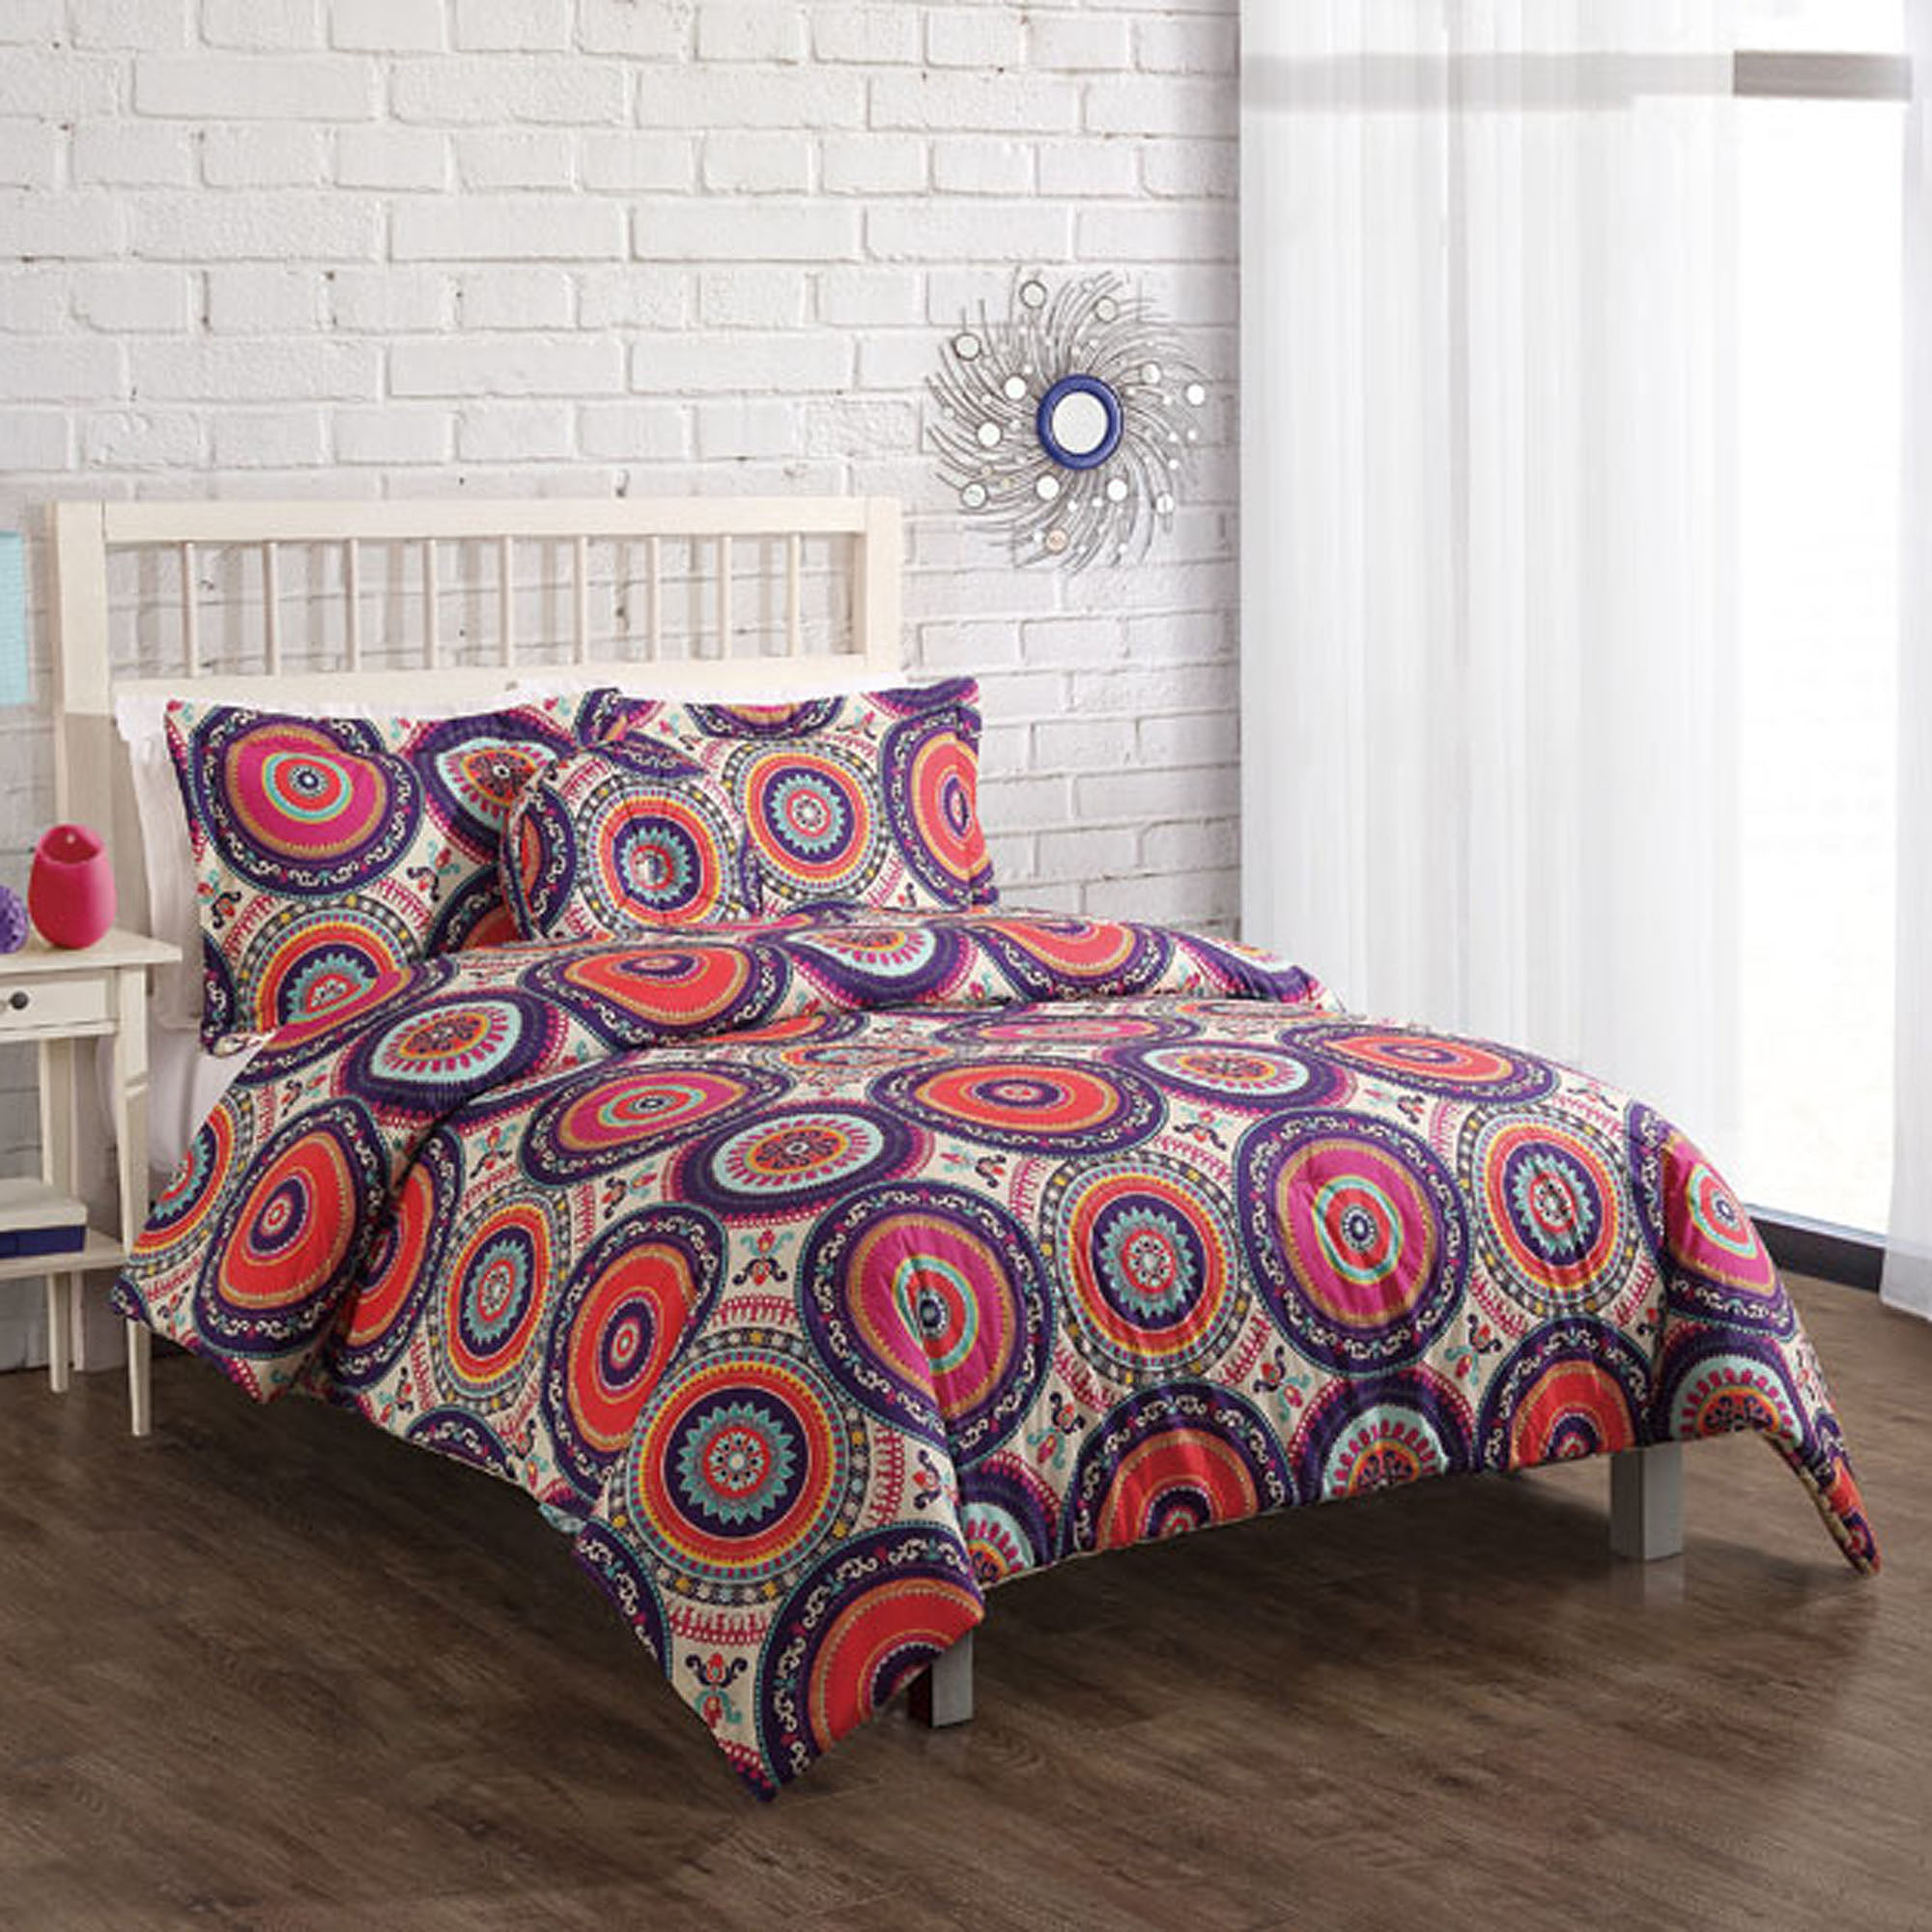 Nina Boho Bedding Comforter Set, Orange